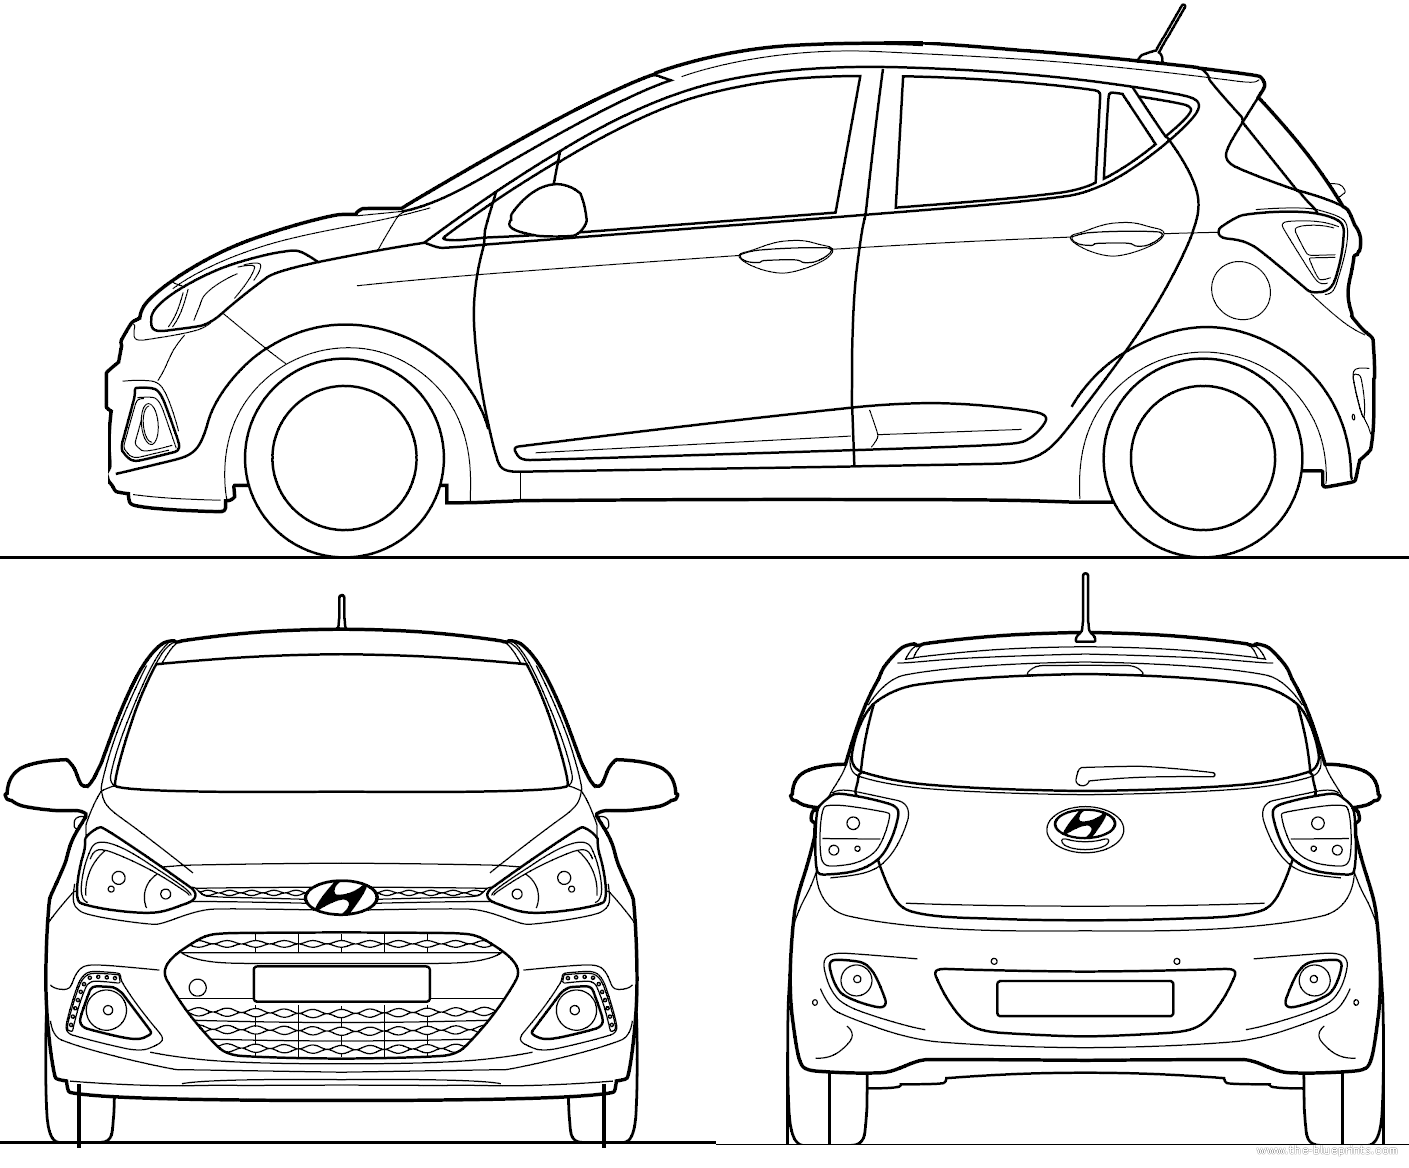 the blueprints cars hyundai hyundai grand i10 2014. Black Bedroom Furniture Sets. Home Design Ideas